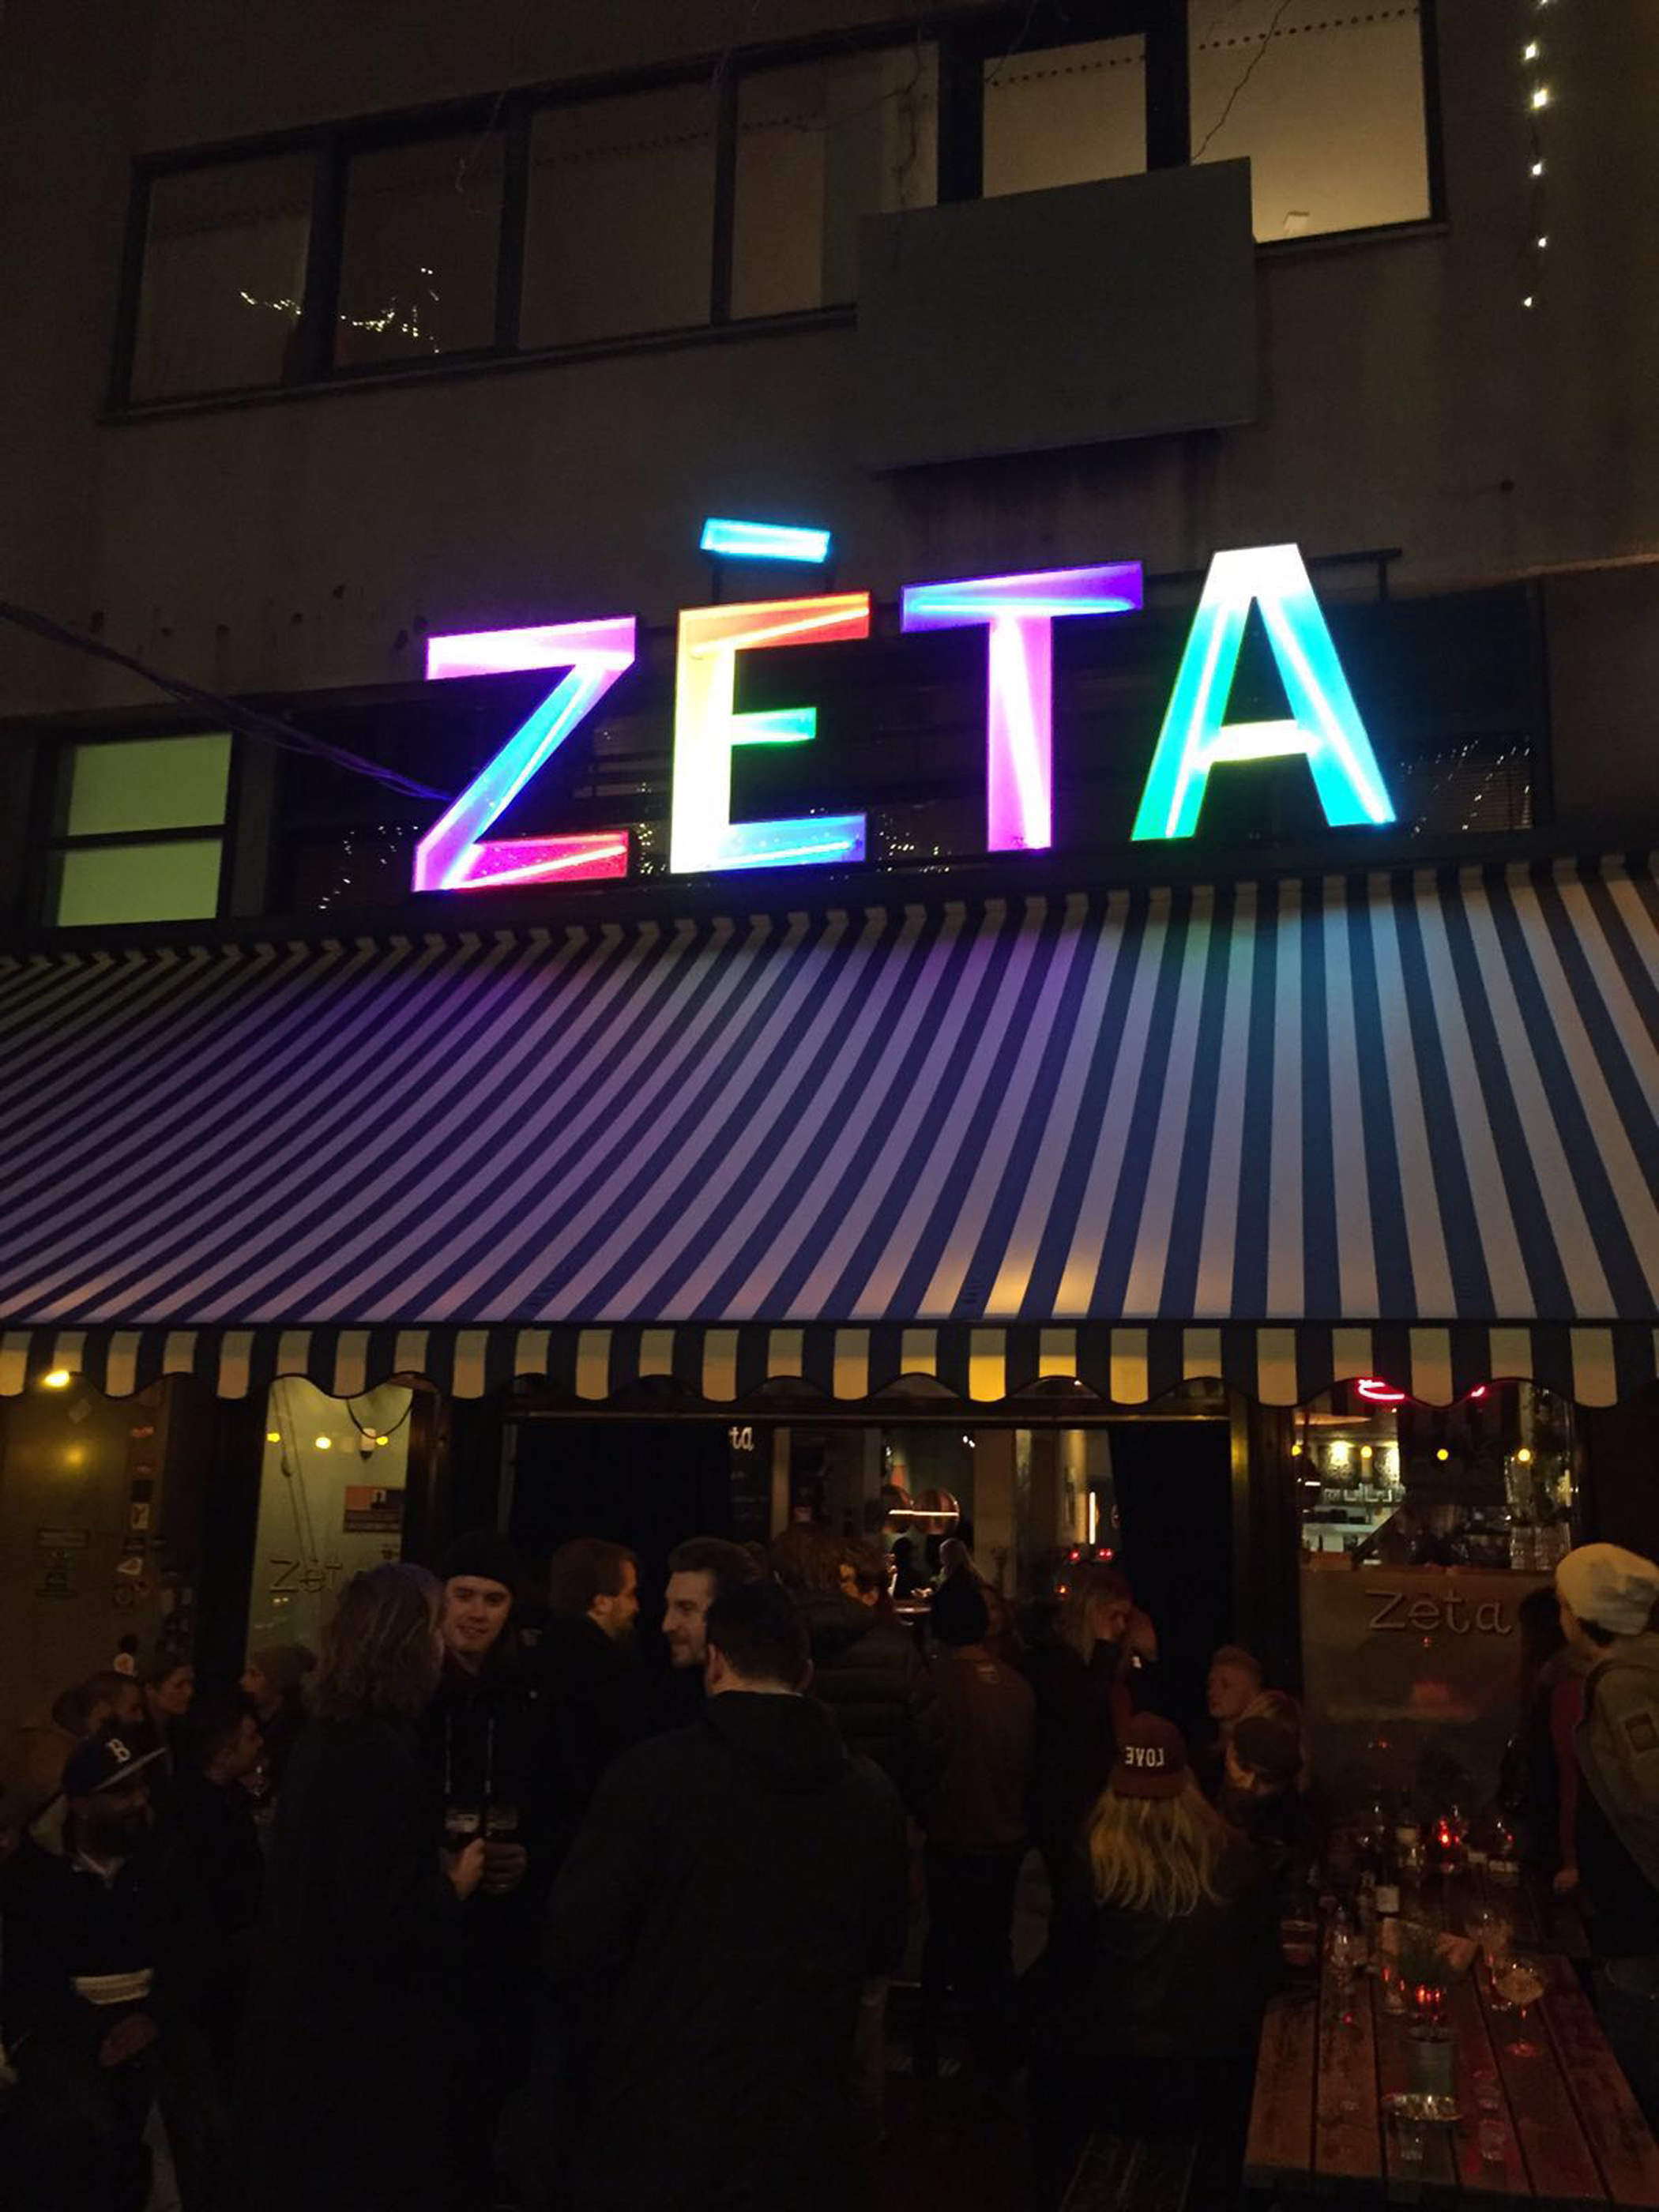 Zeta licht logo